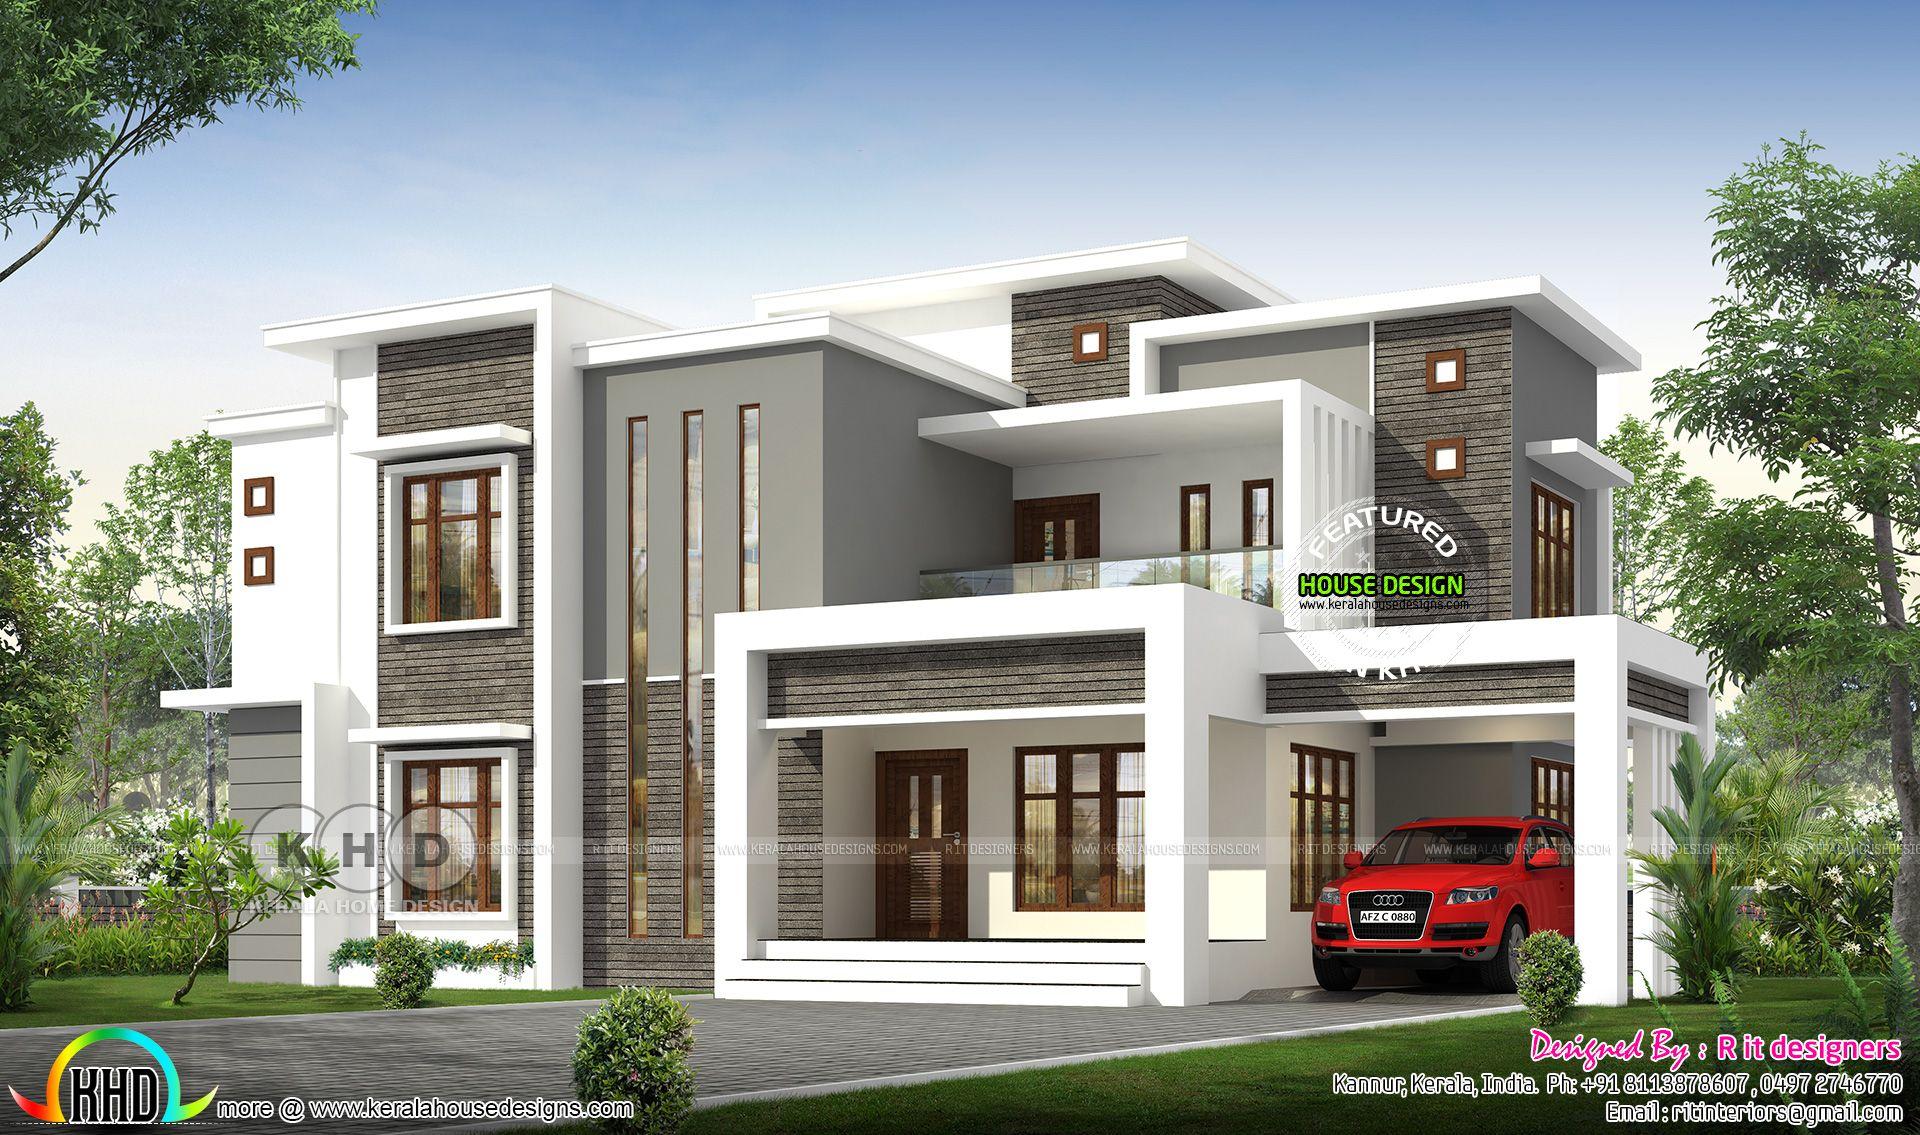 2496 Sq Ft Flat Roof Modern Contemporary Kerala House Kerala House Design Contemporary House Plans Duplex House Design